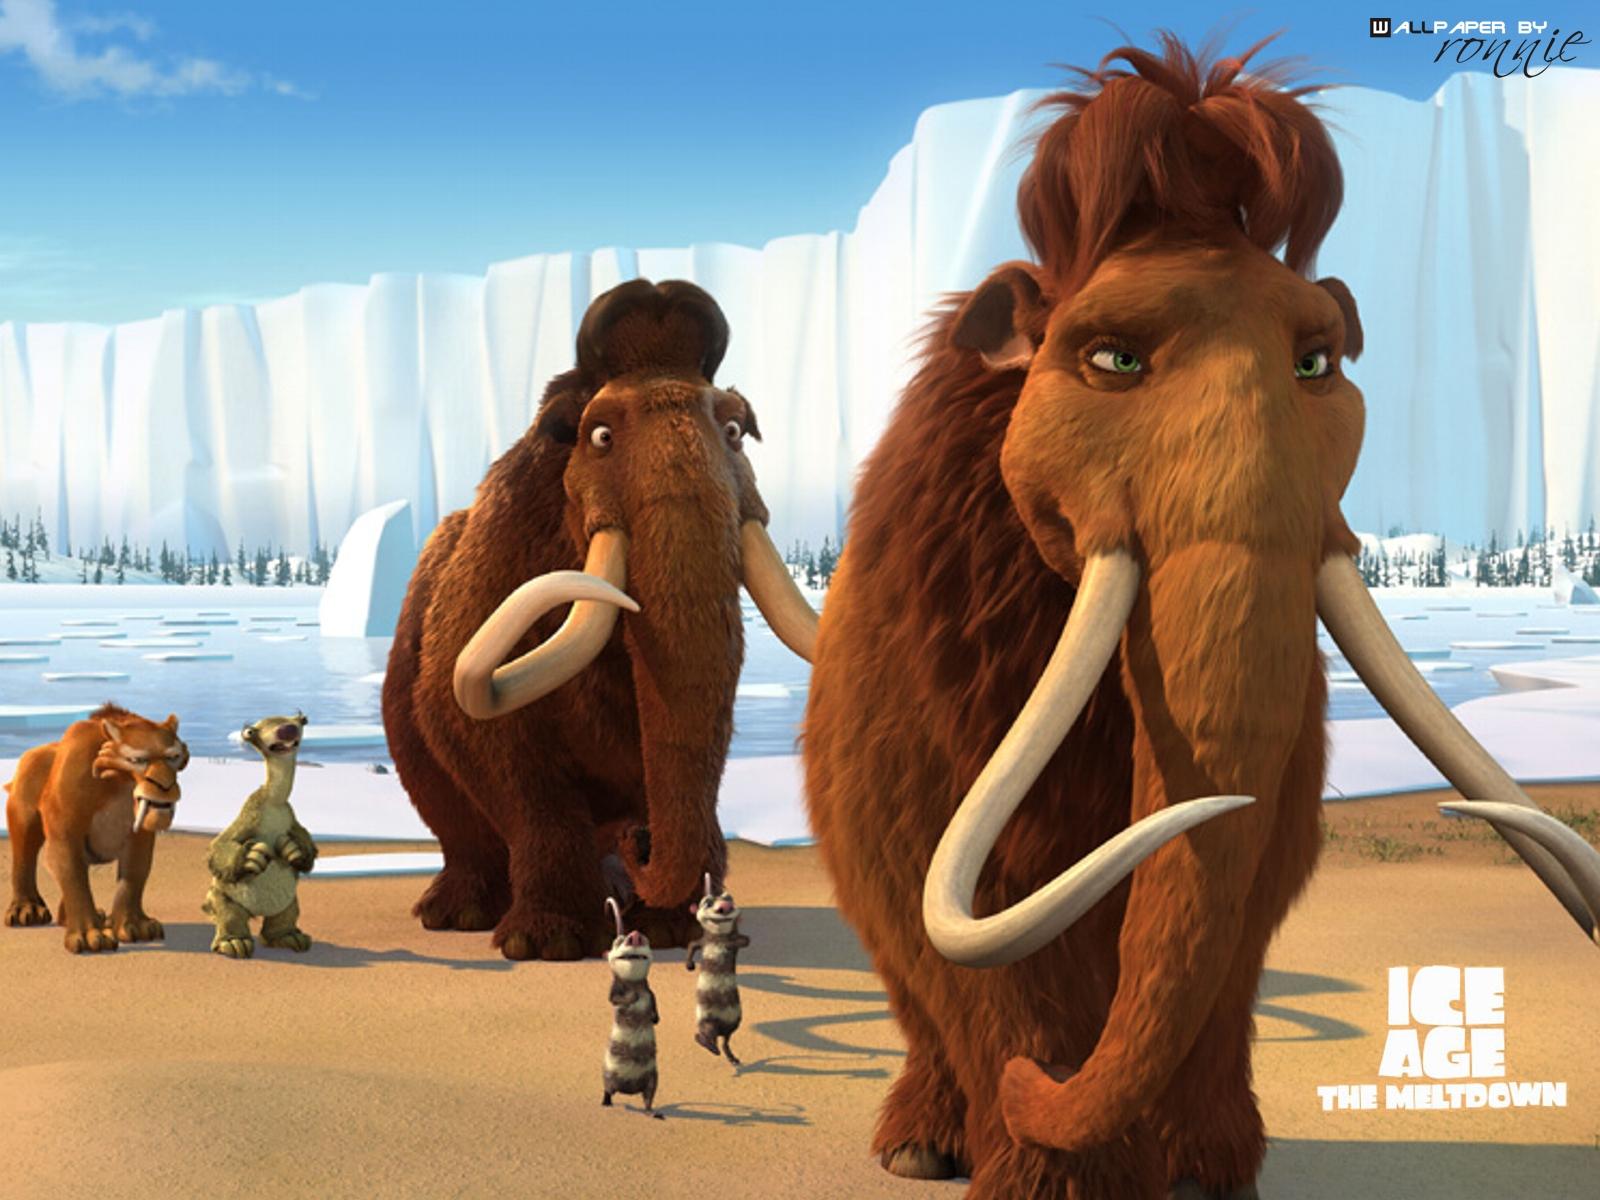 15 Film Animasi Terbaik Sepanjang Masa TOPSCORE AND NEWS